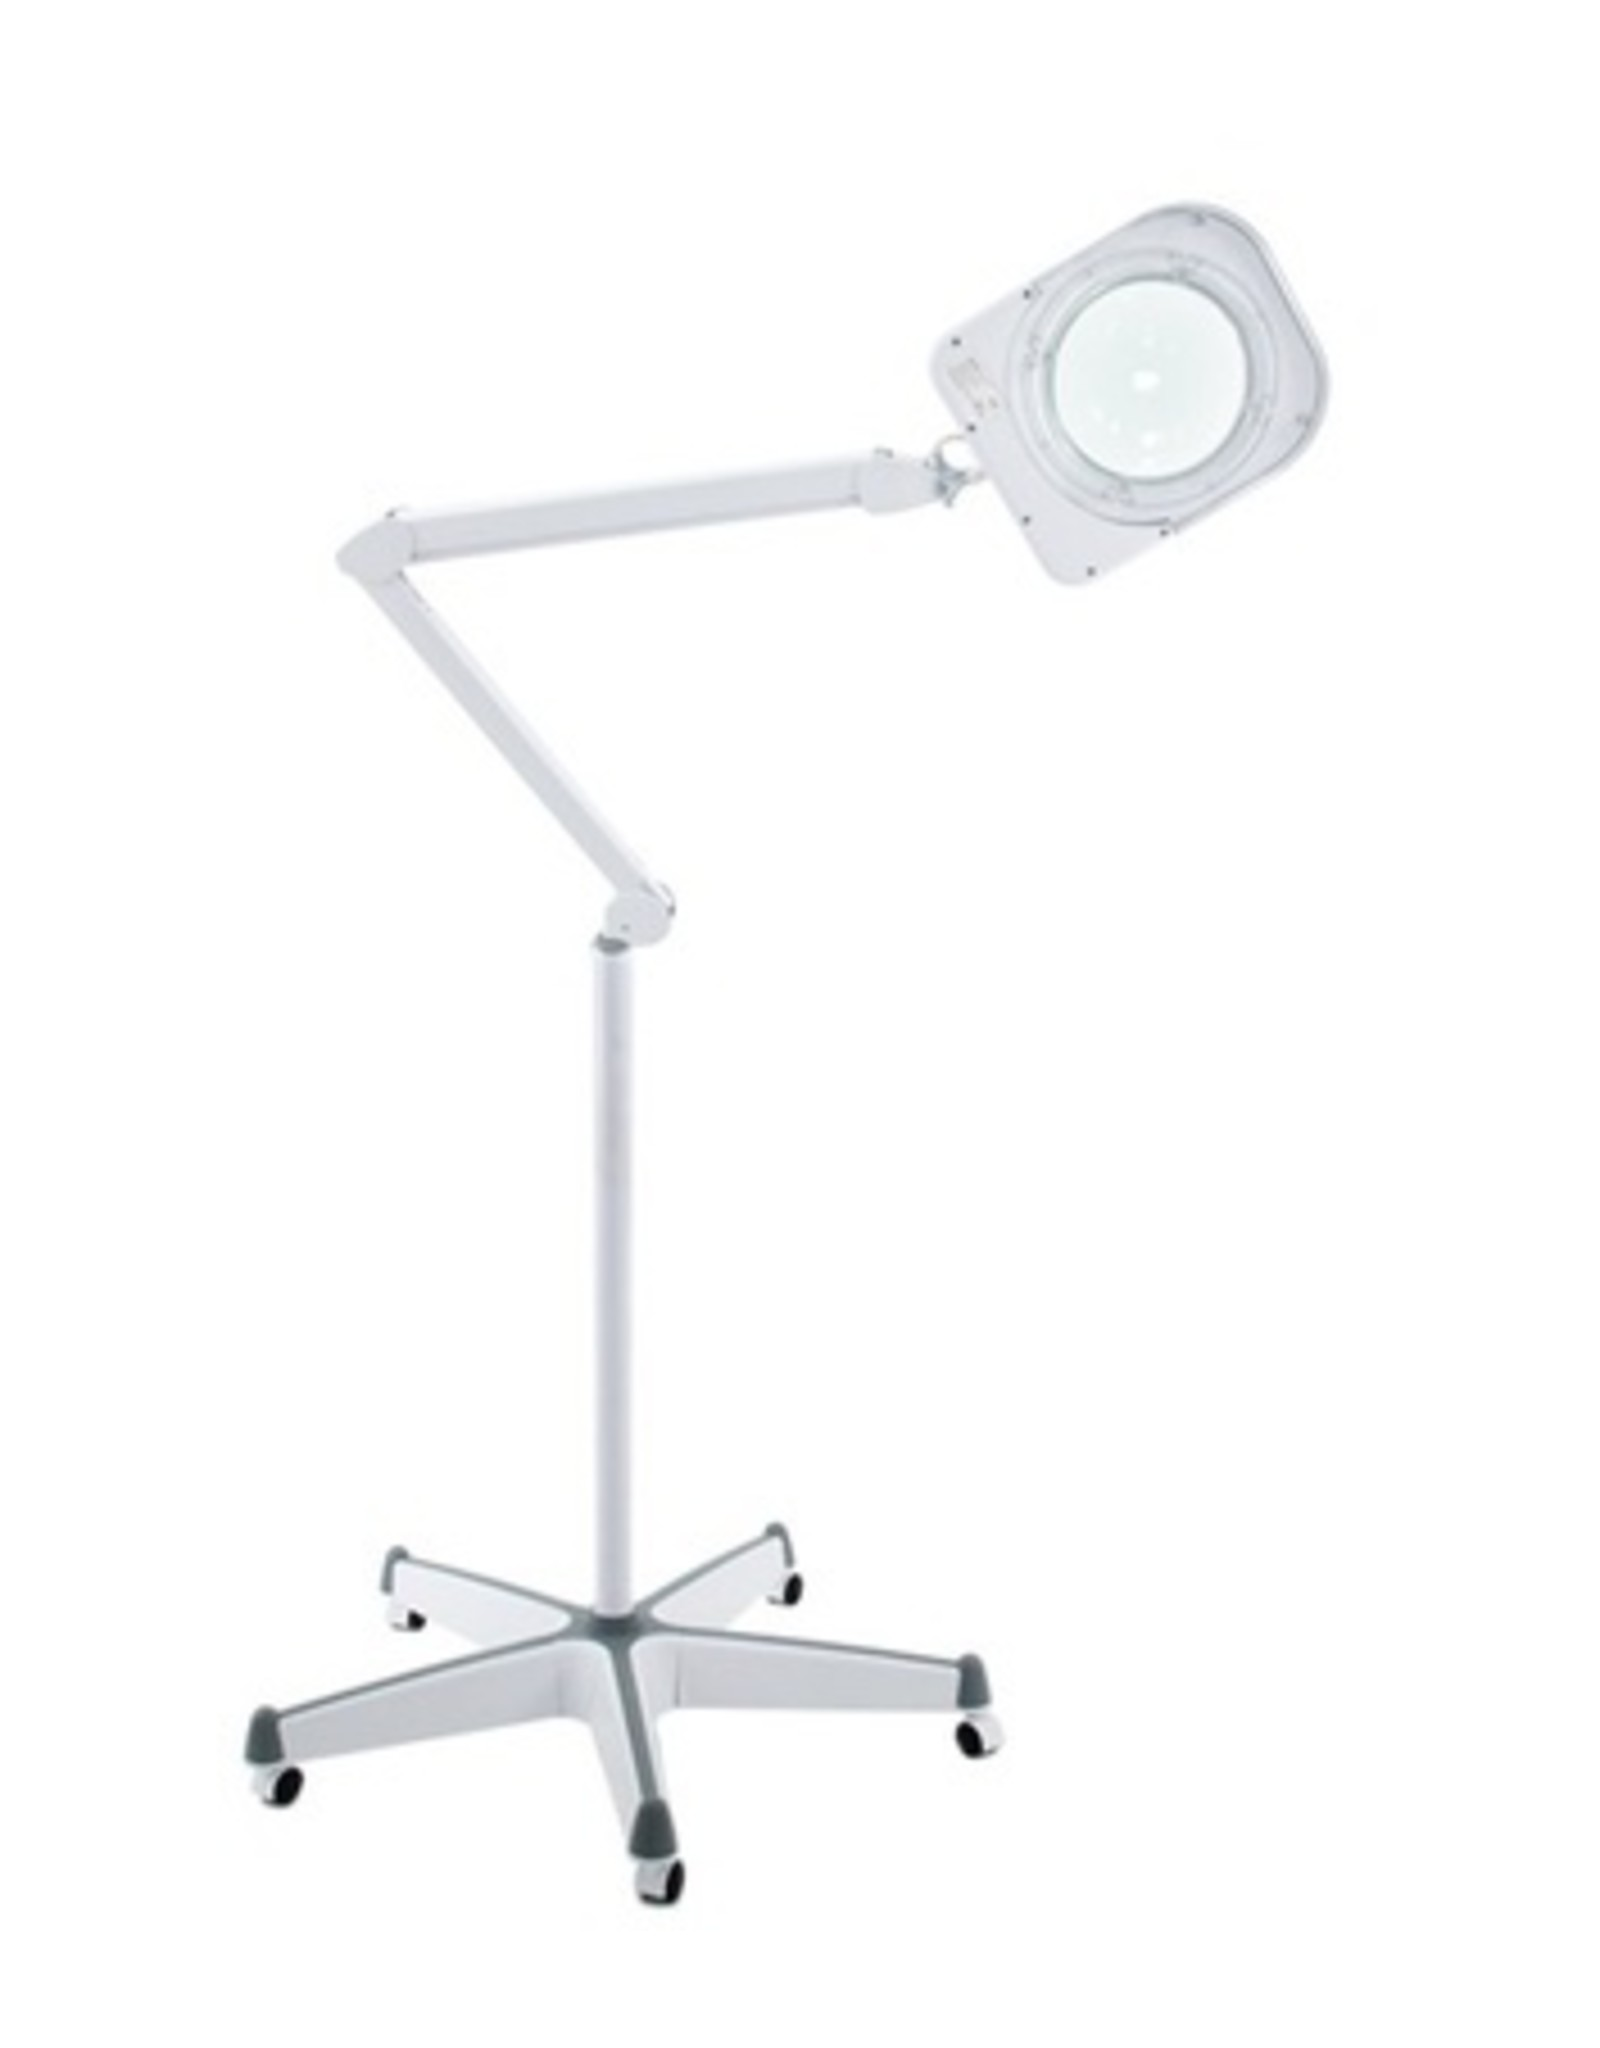 Merkloos Loeplamp 6015 Intensety LED + Rolstatief